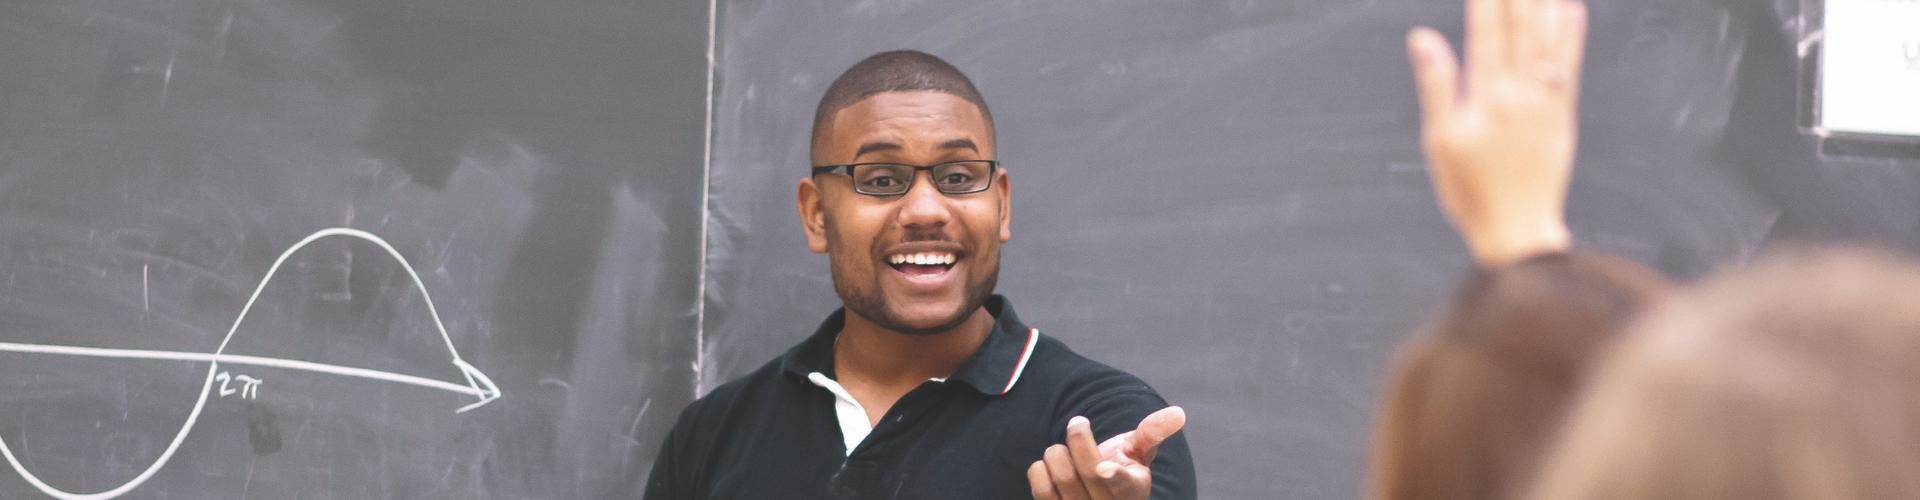 High School Physics Teacher Preparation